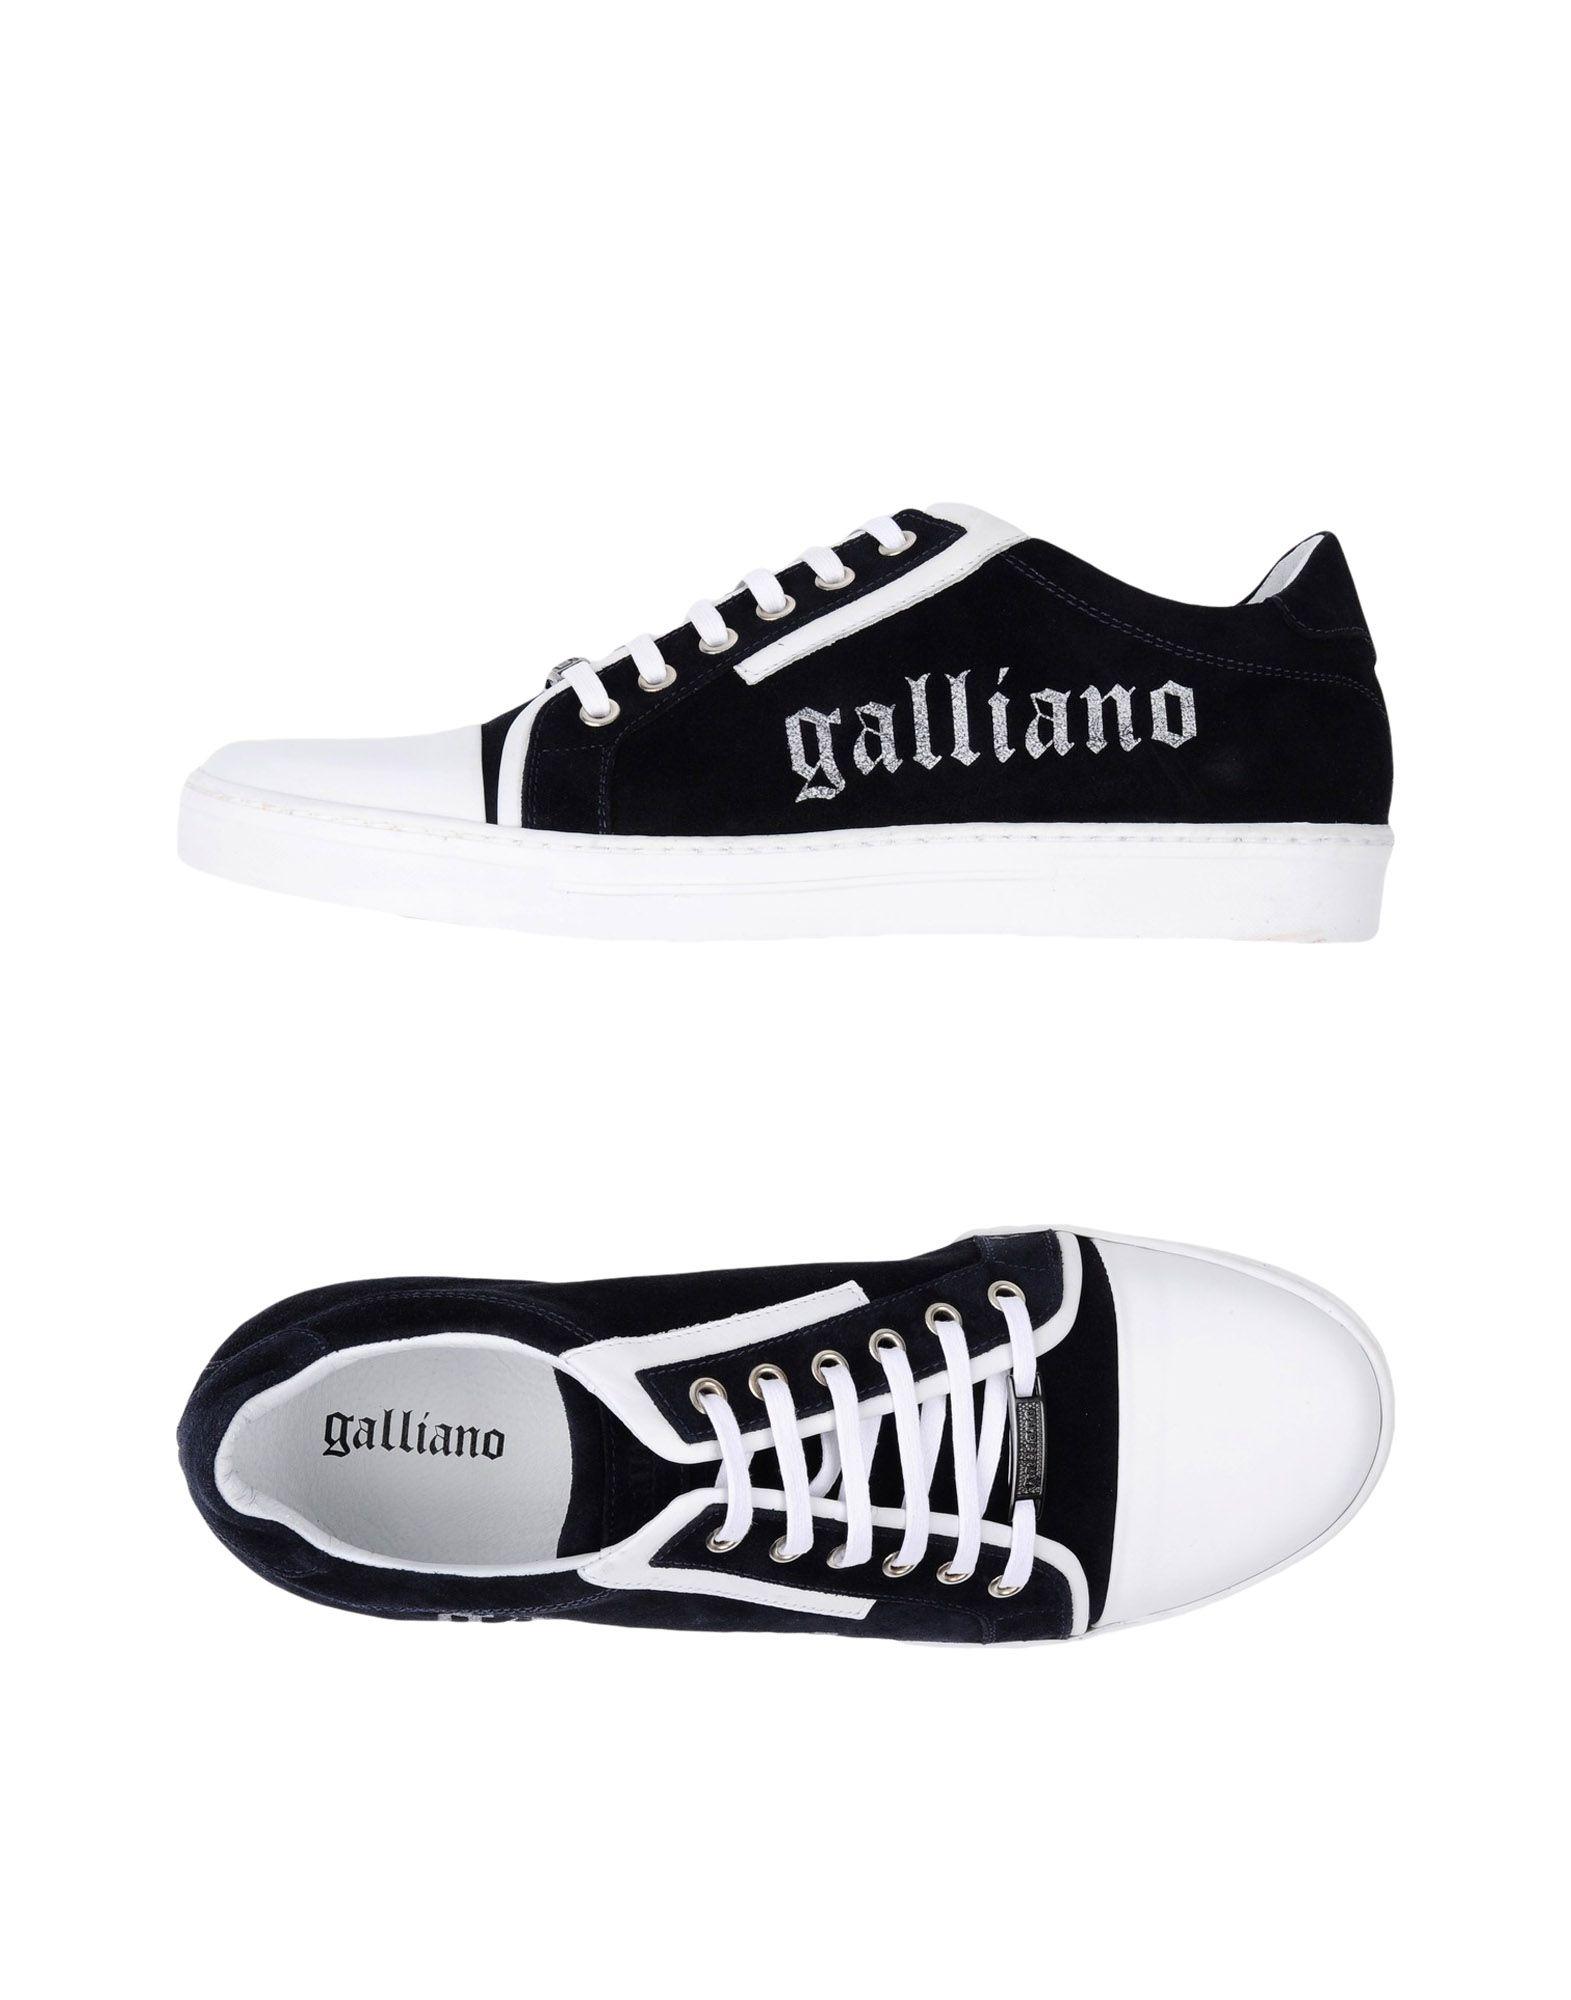 Galliano Galliano  Sneakers Herren  11336052EW 2520fd